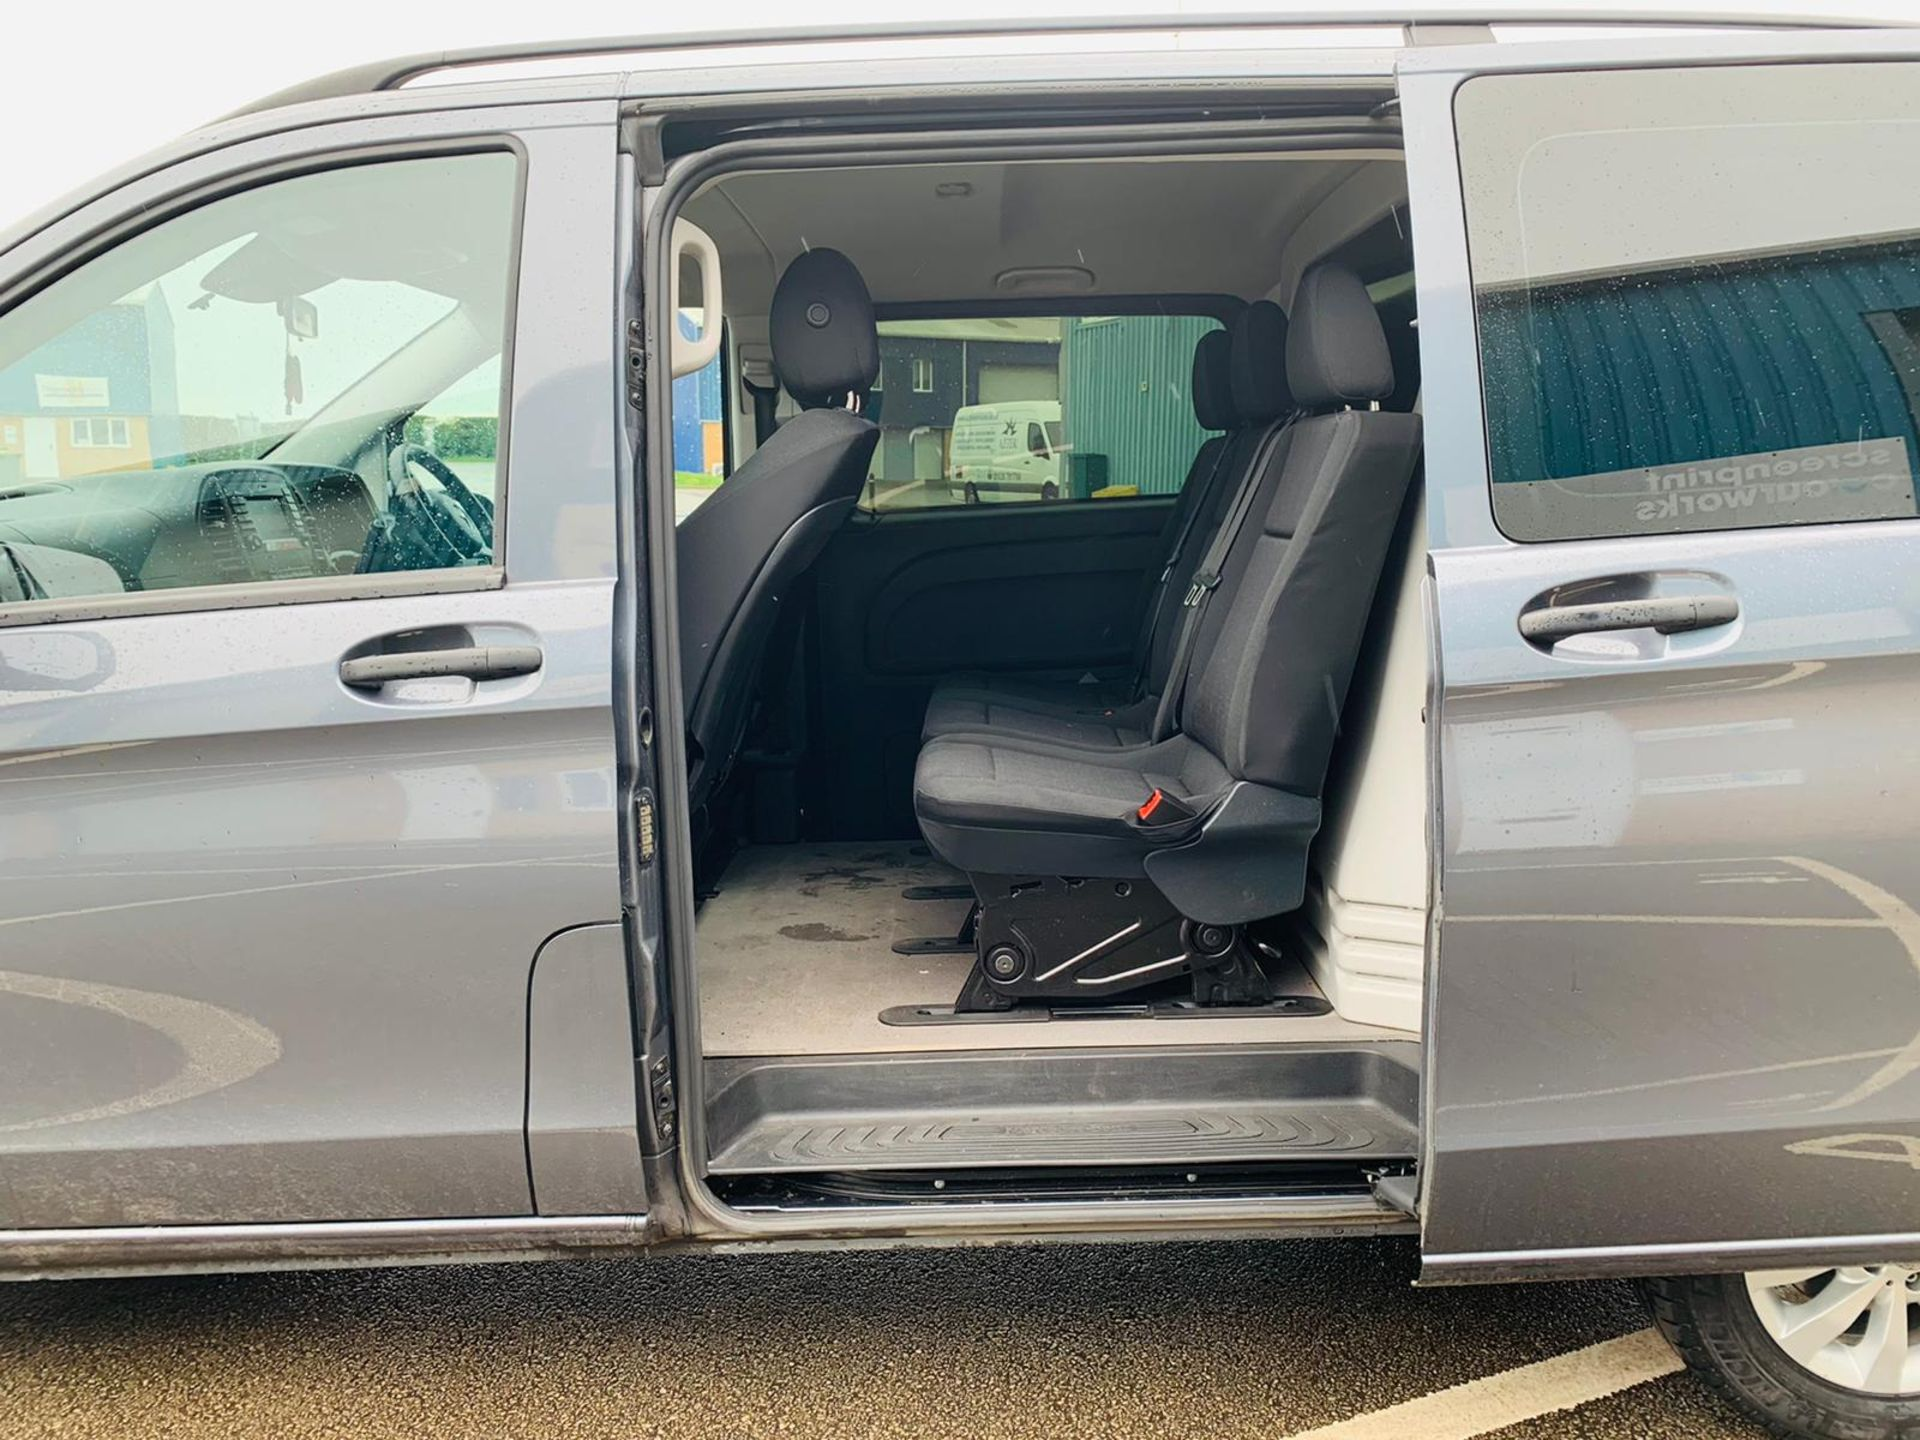 Mercedes Vito 114 Bluetec Dualiner/Crew Van - Auto - Air Con - 2018 18 Reg - 1 Owner From New - Image 11 of 25